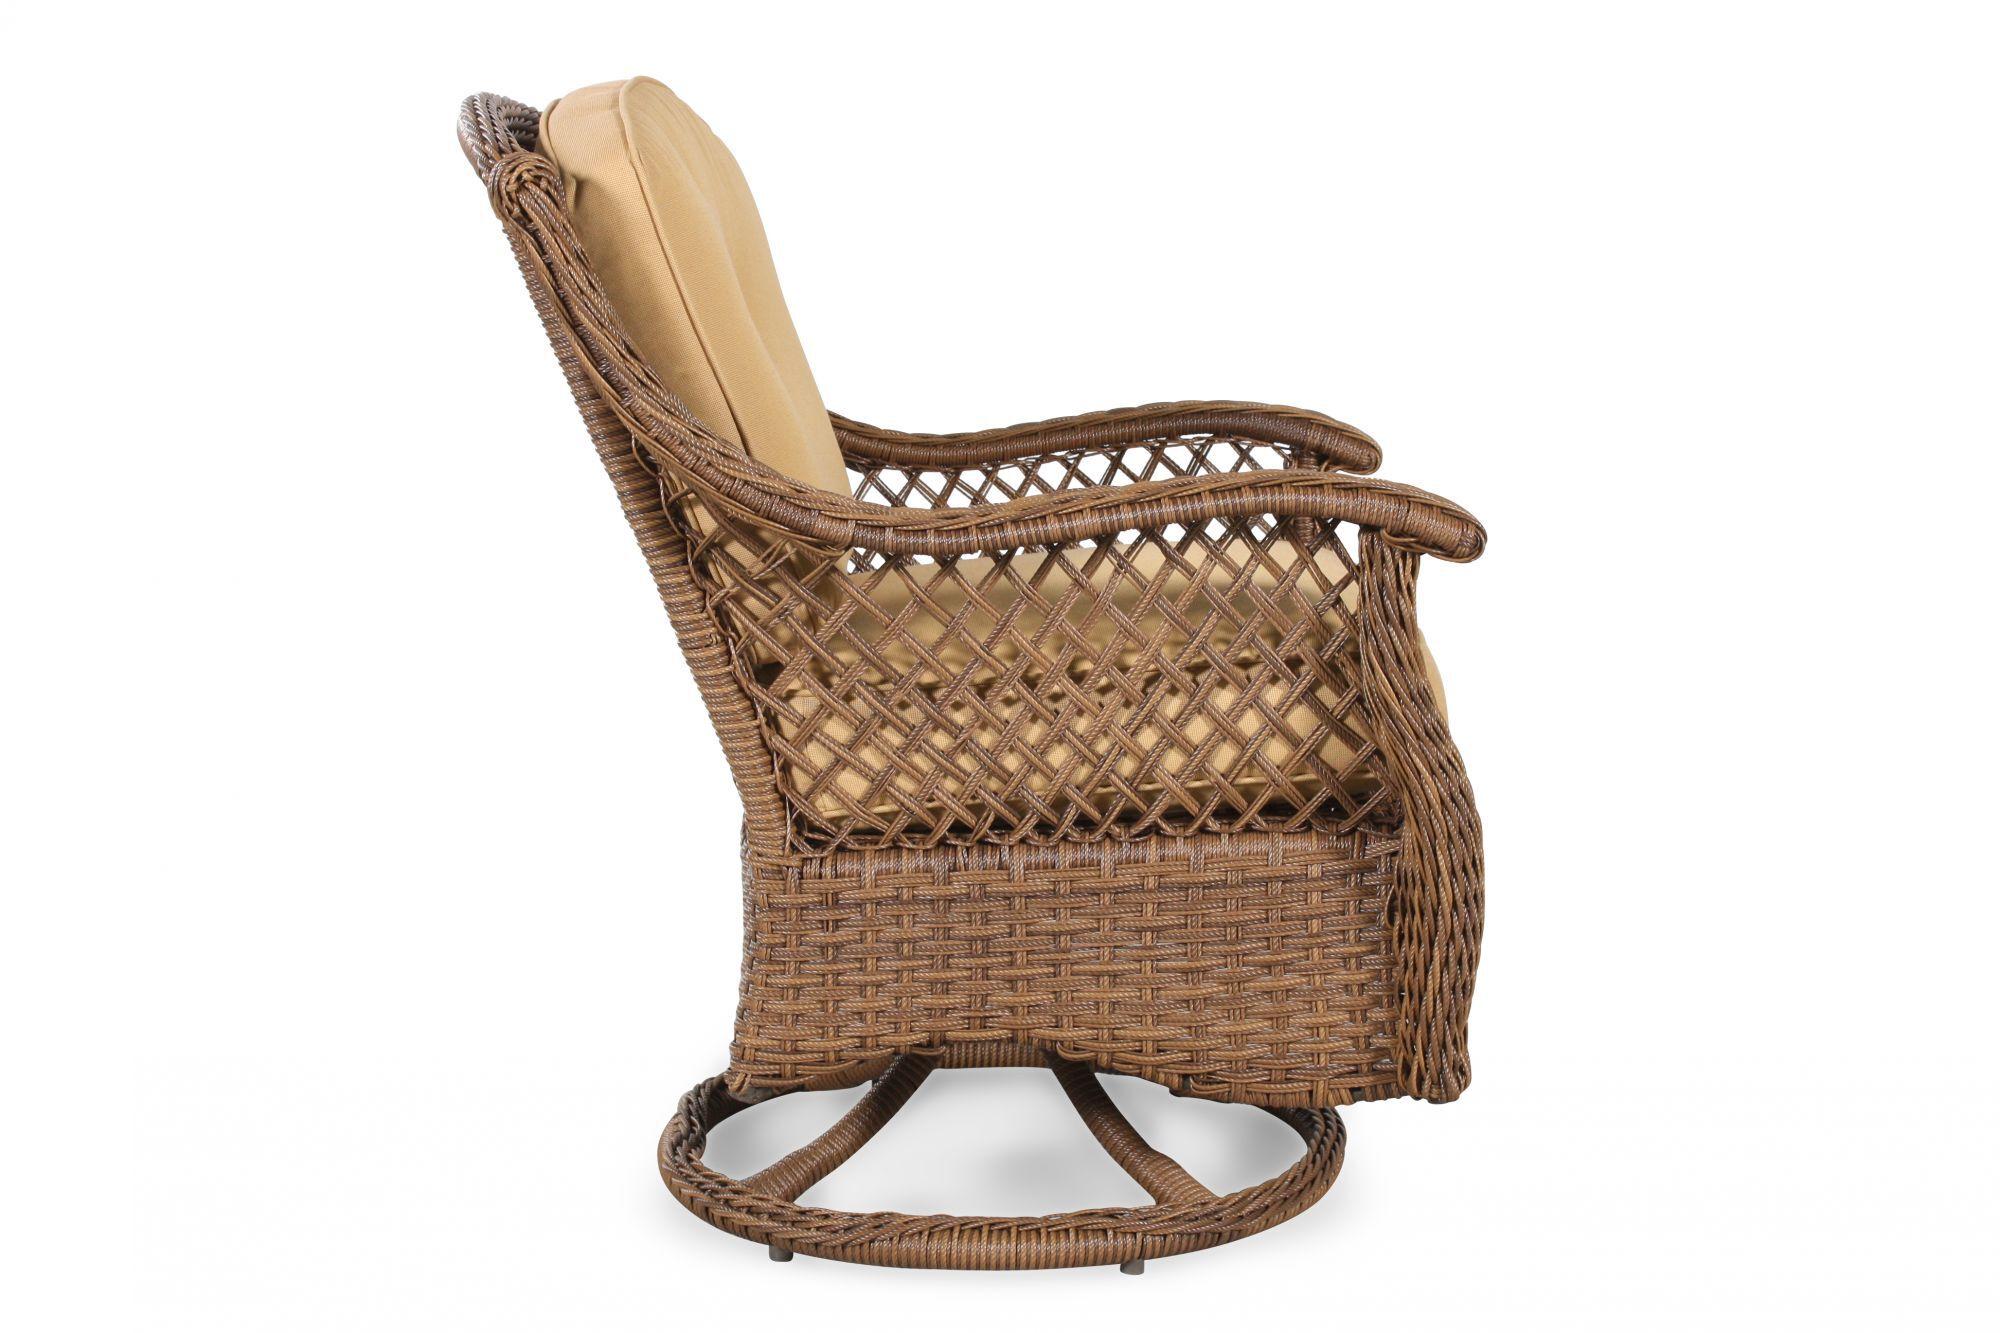 agio veranda patio swivel rocker chair - Swivel Rocker Chair